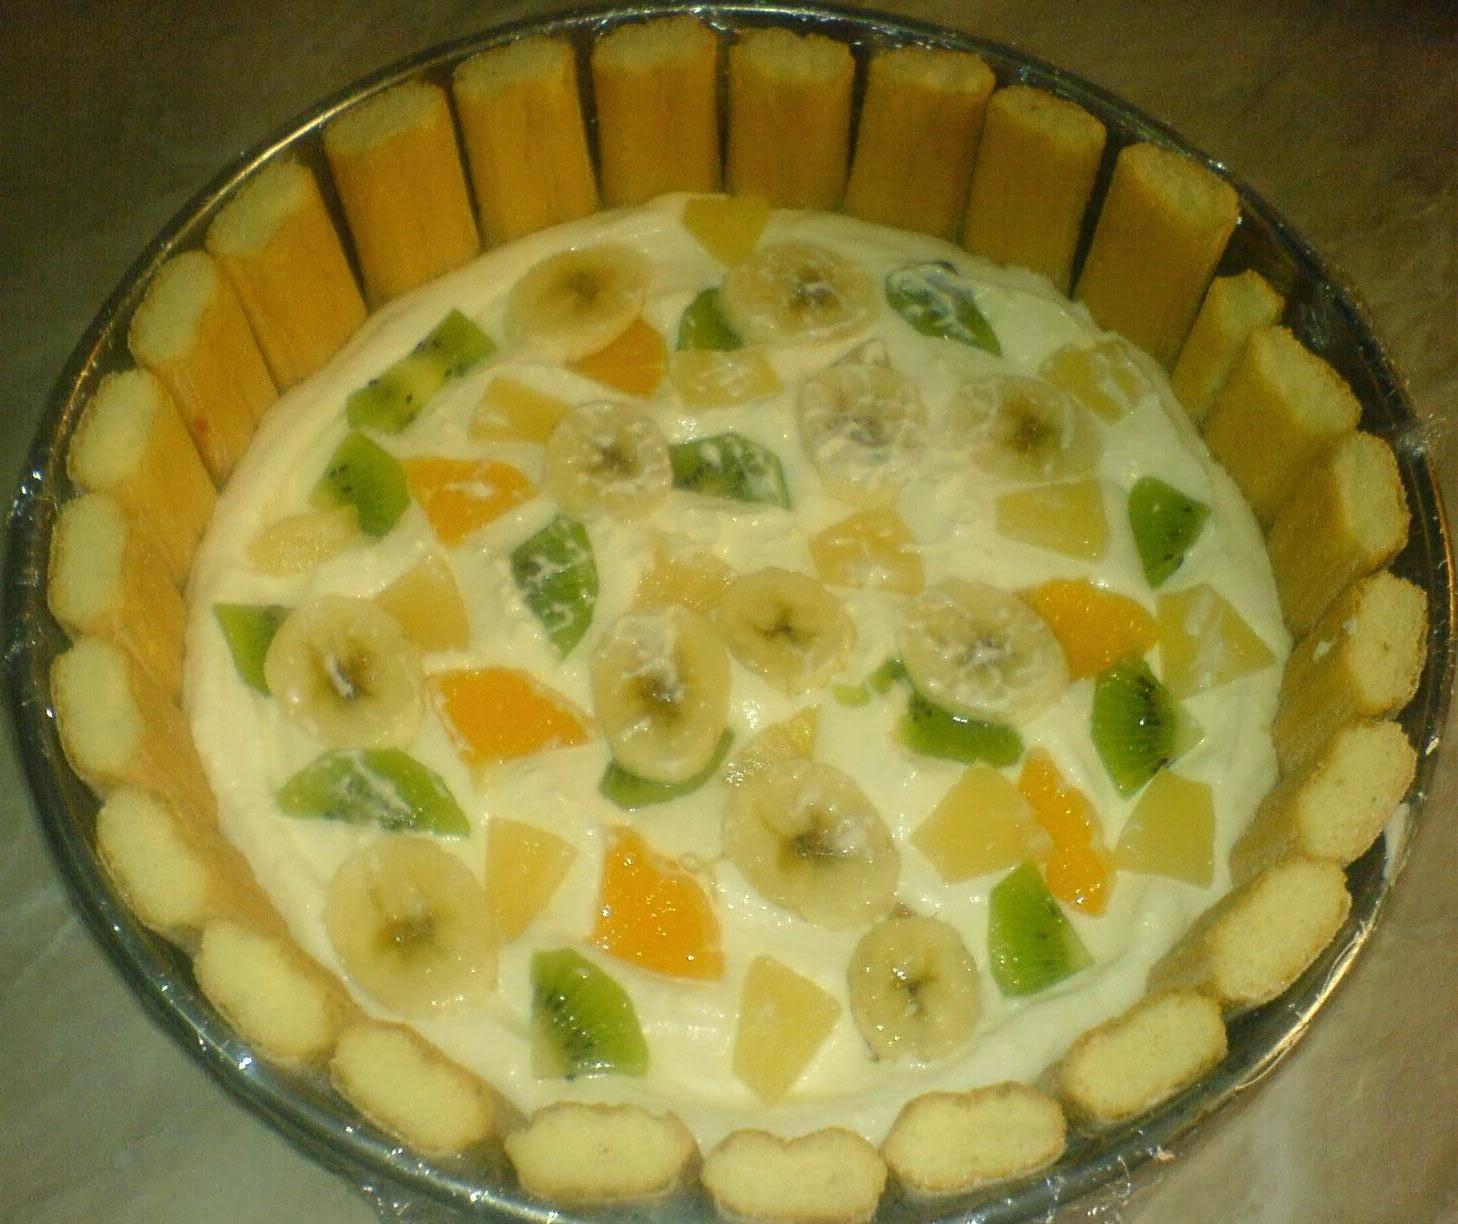 preparare tort diplomat, preparare tort diplomat cu fructe, preparare tort diplomat cu fructe si piscoturi, cum se prepara tortul diplomat, cum facem tort diplomat, cum preparam tort diplomat, retete si preparate culinare tort diplomat,